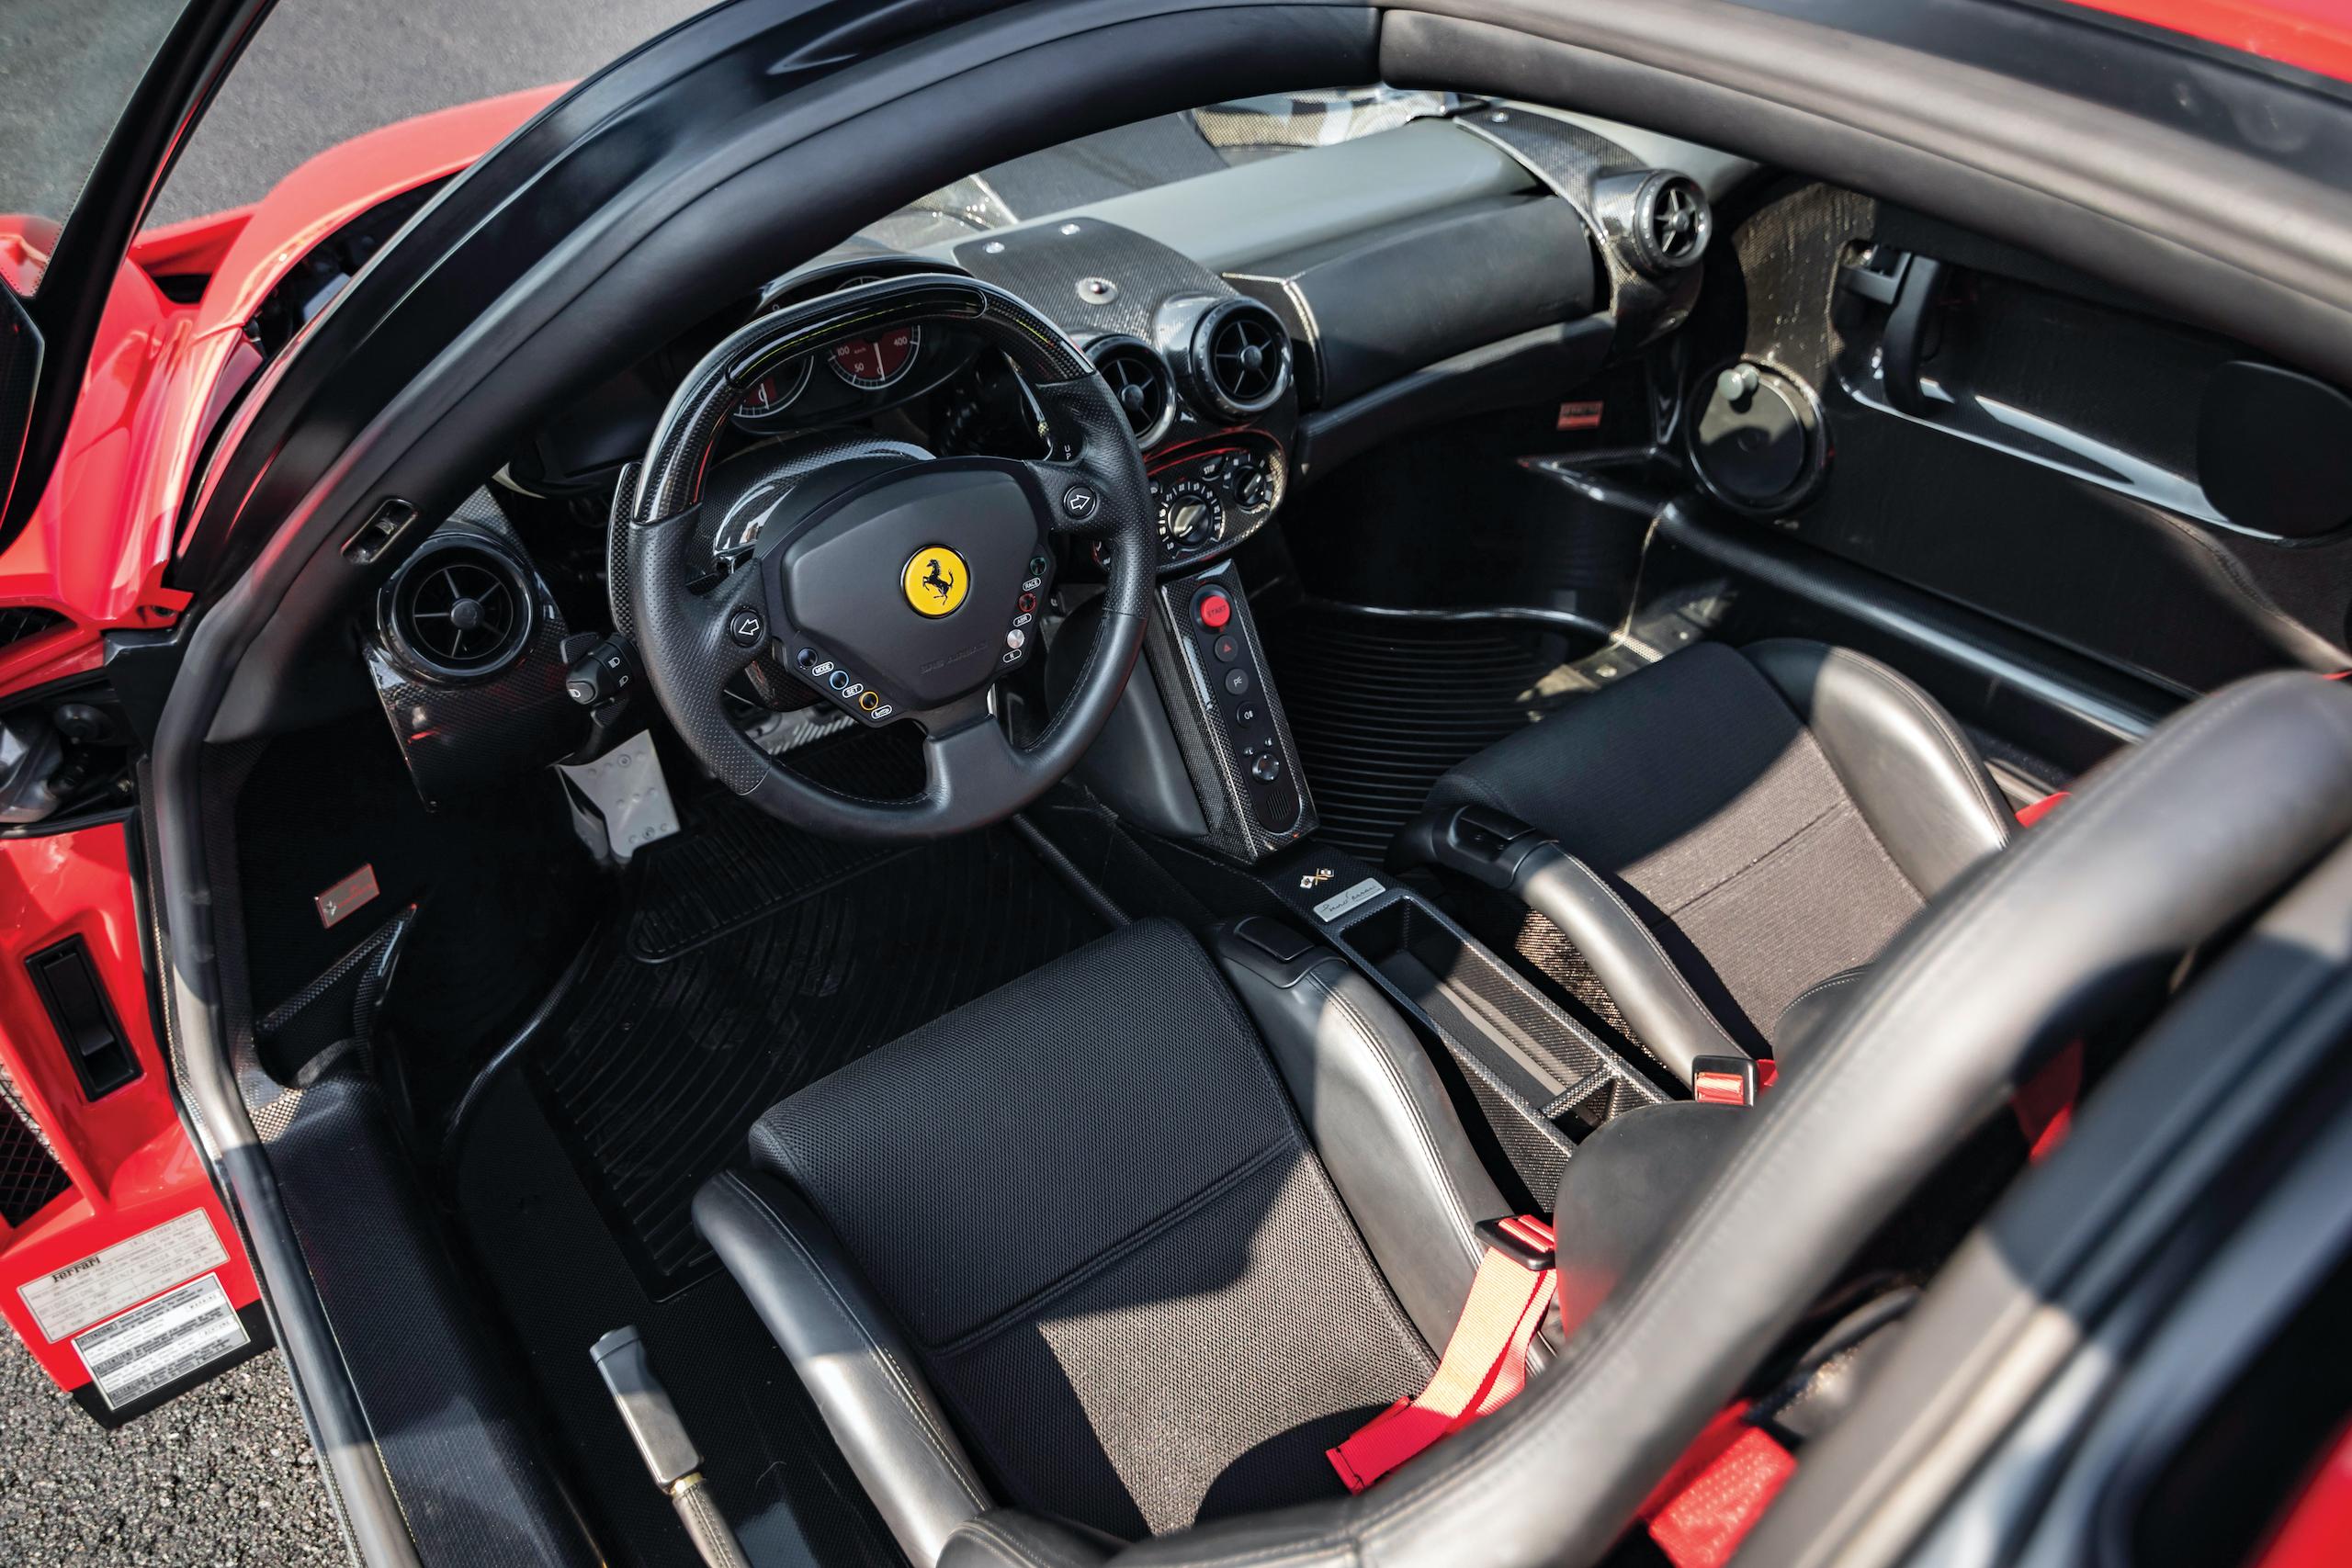 2003 Ferrari Enzo interior